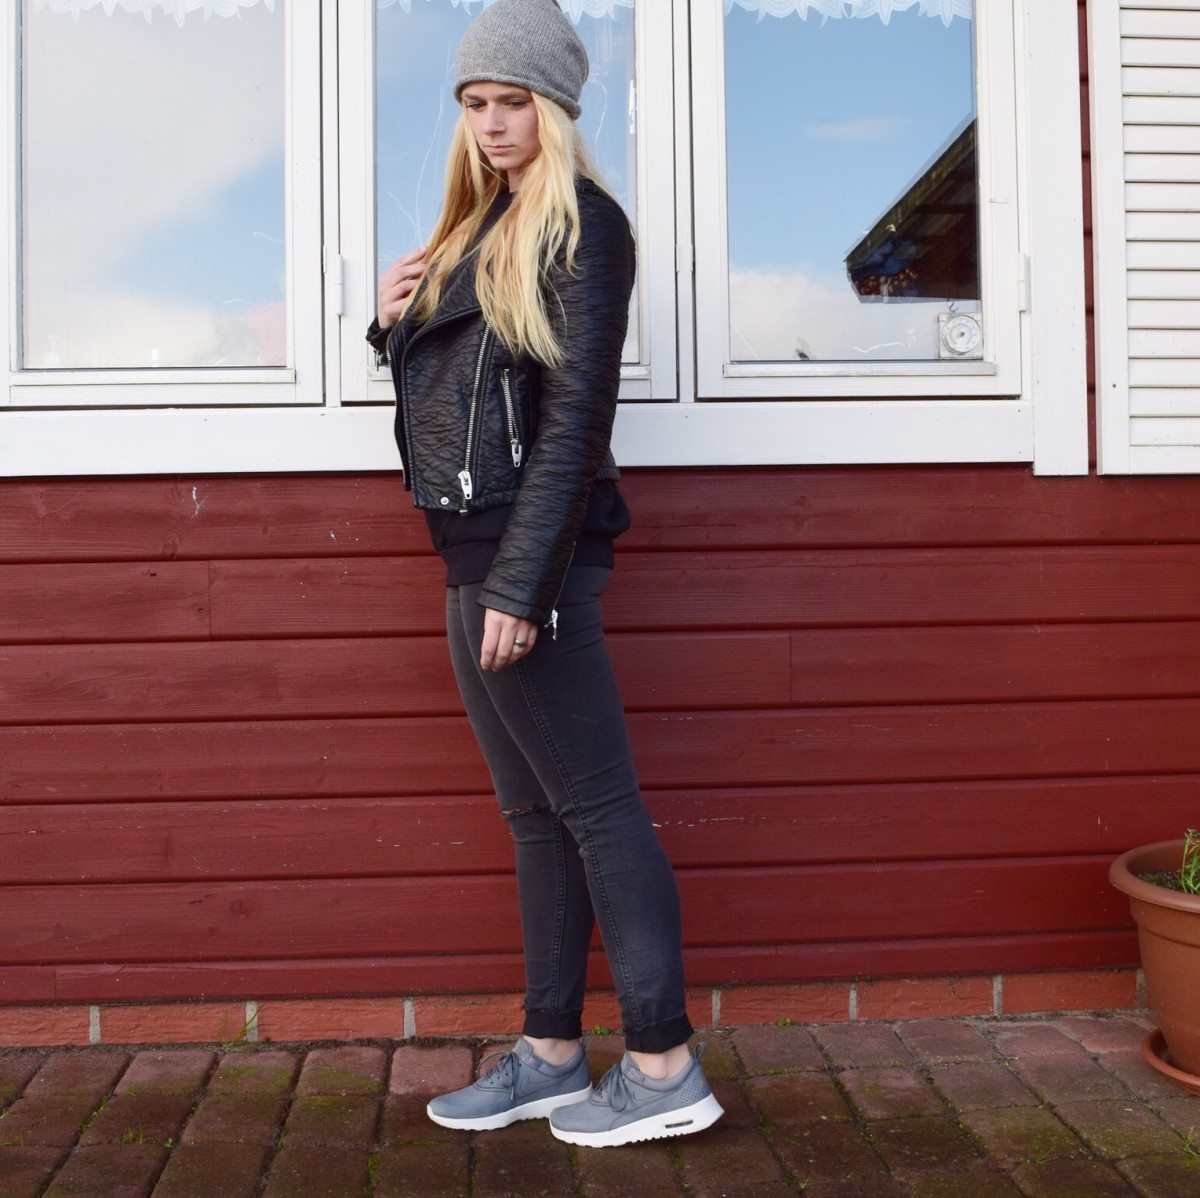 graue-mütze-schwarzer-pullover-lederjacke-nike-air-max-thea-sneaker-swanted